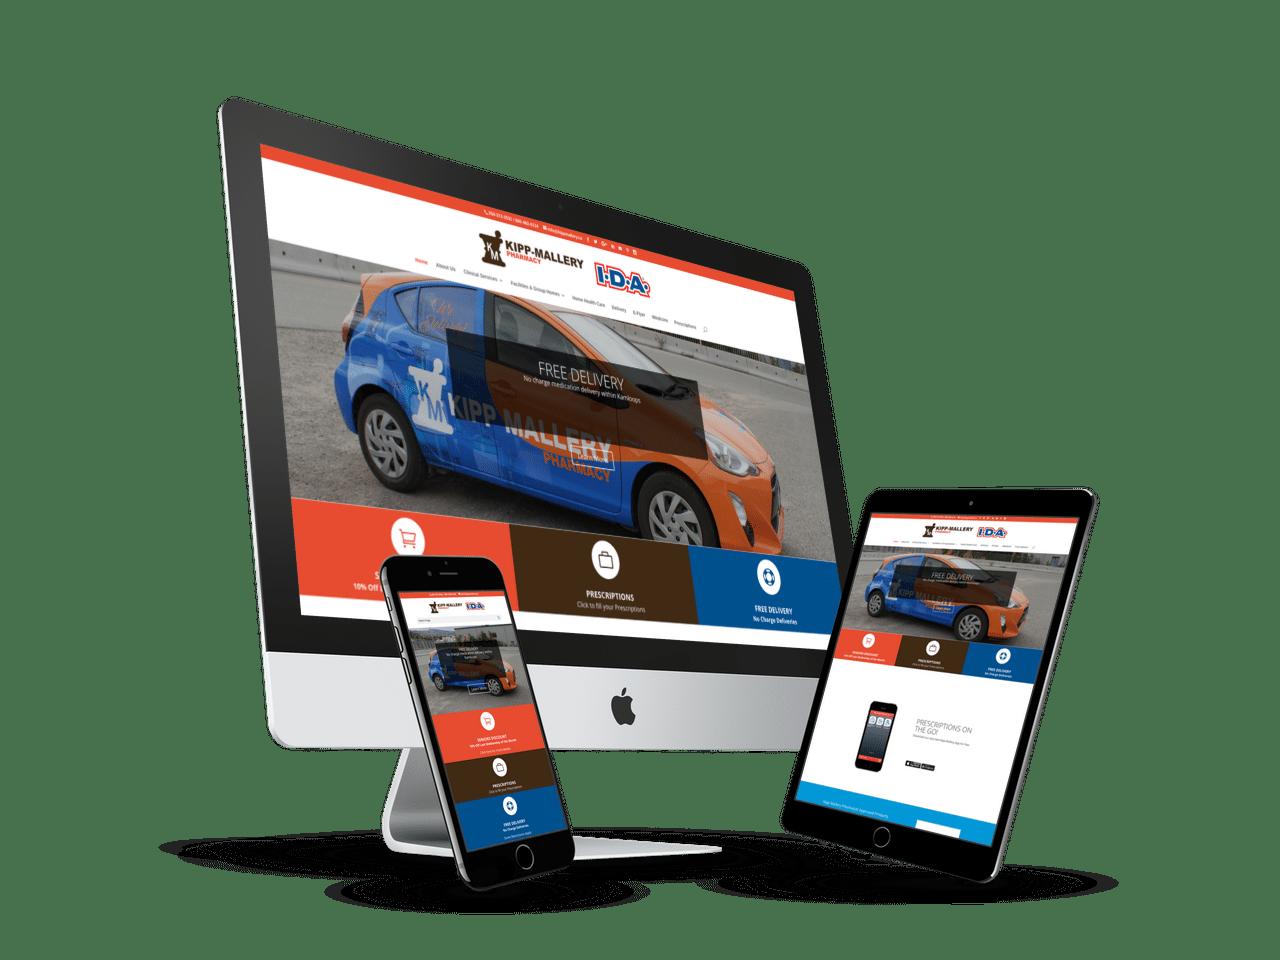 Responsive website designed for Kipp-Mallery Pharmacy in Kamloops, BC